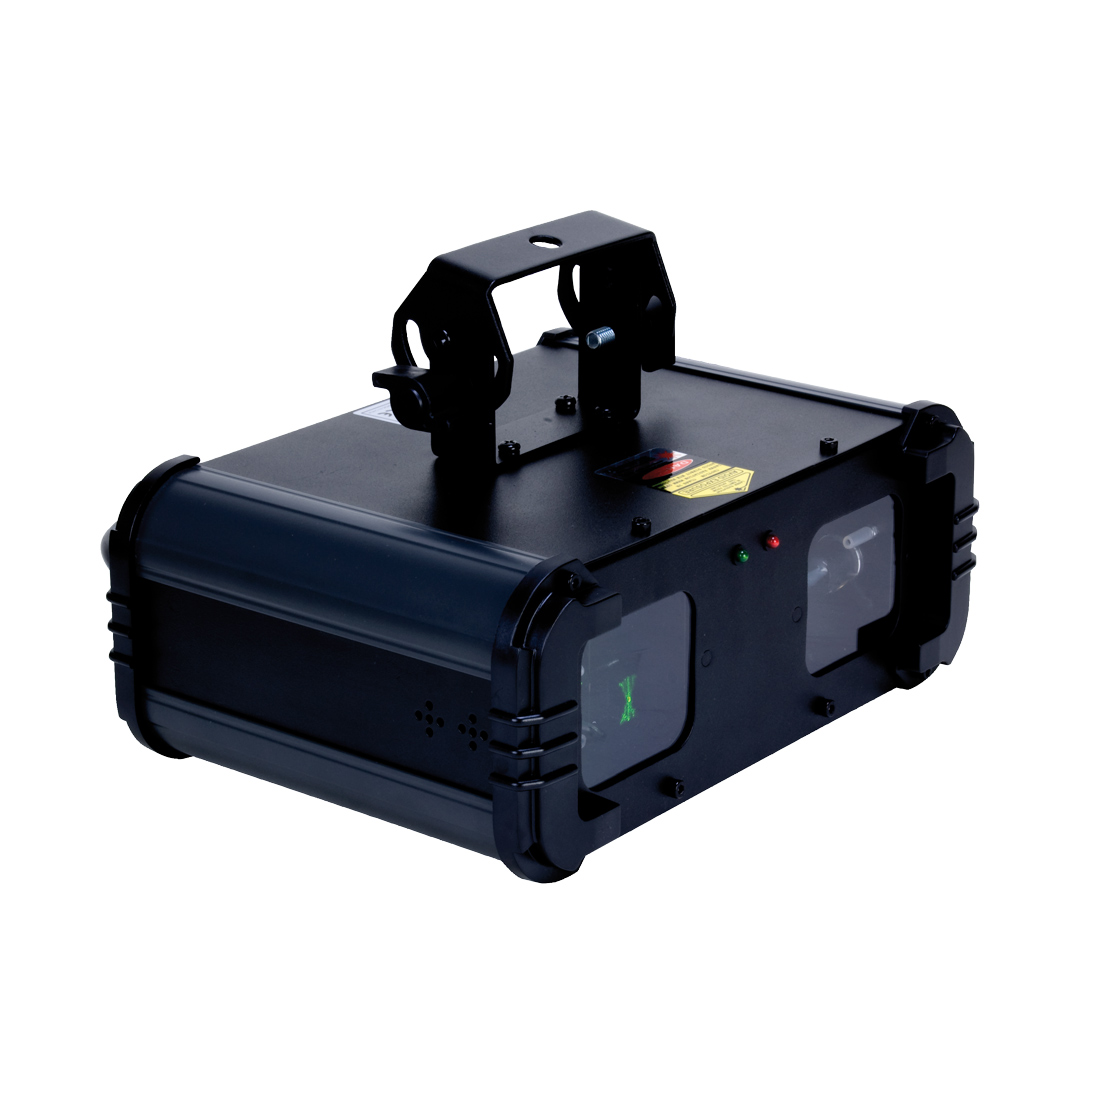 Duo Scan RG (30G/80R)